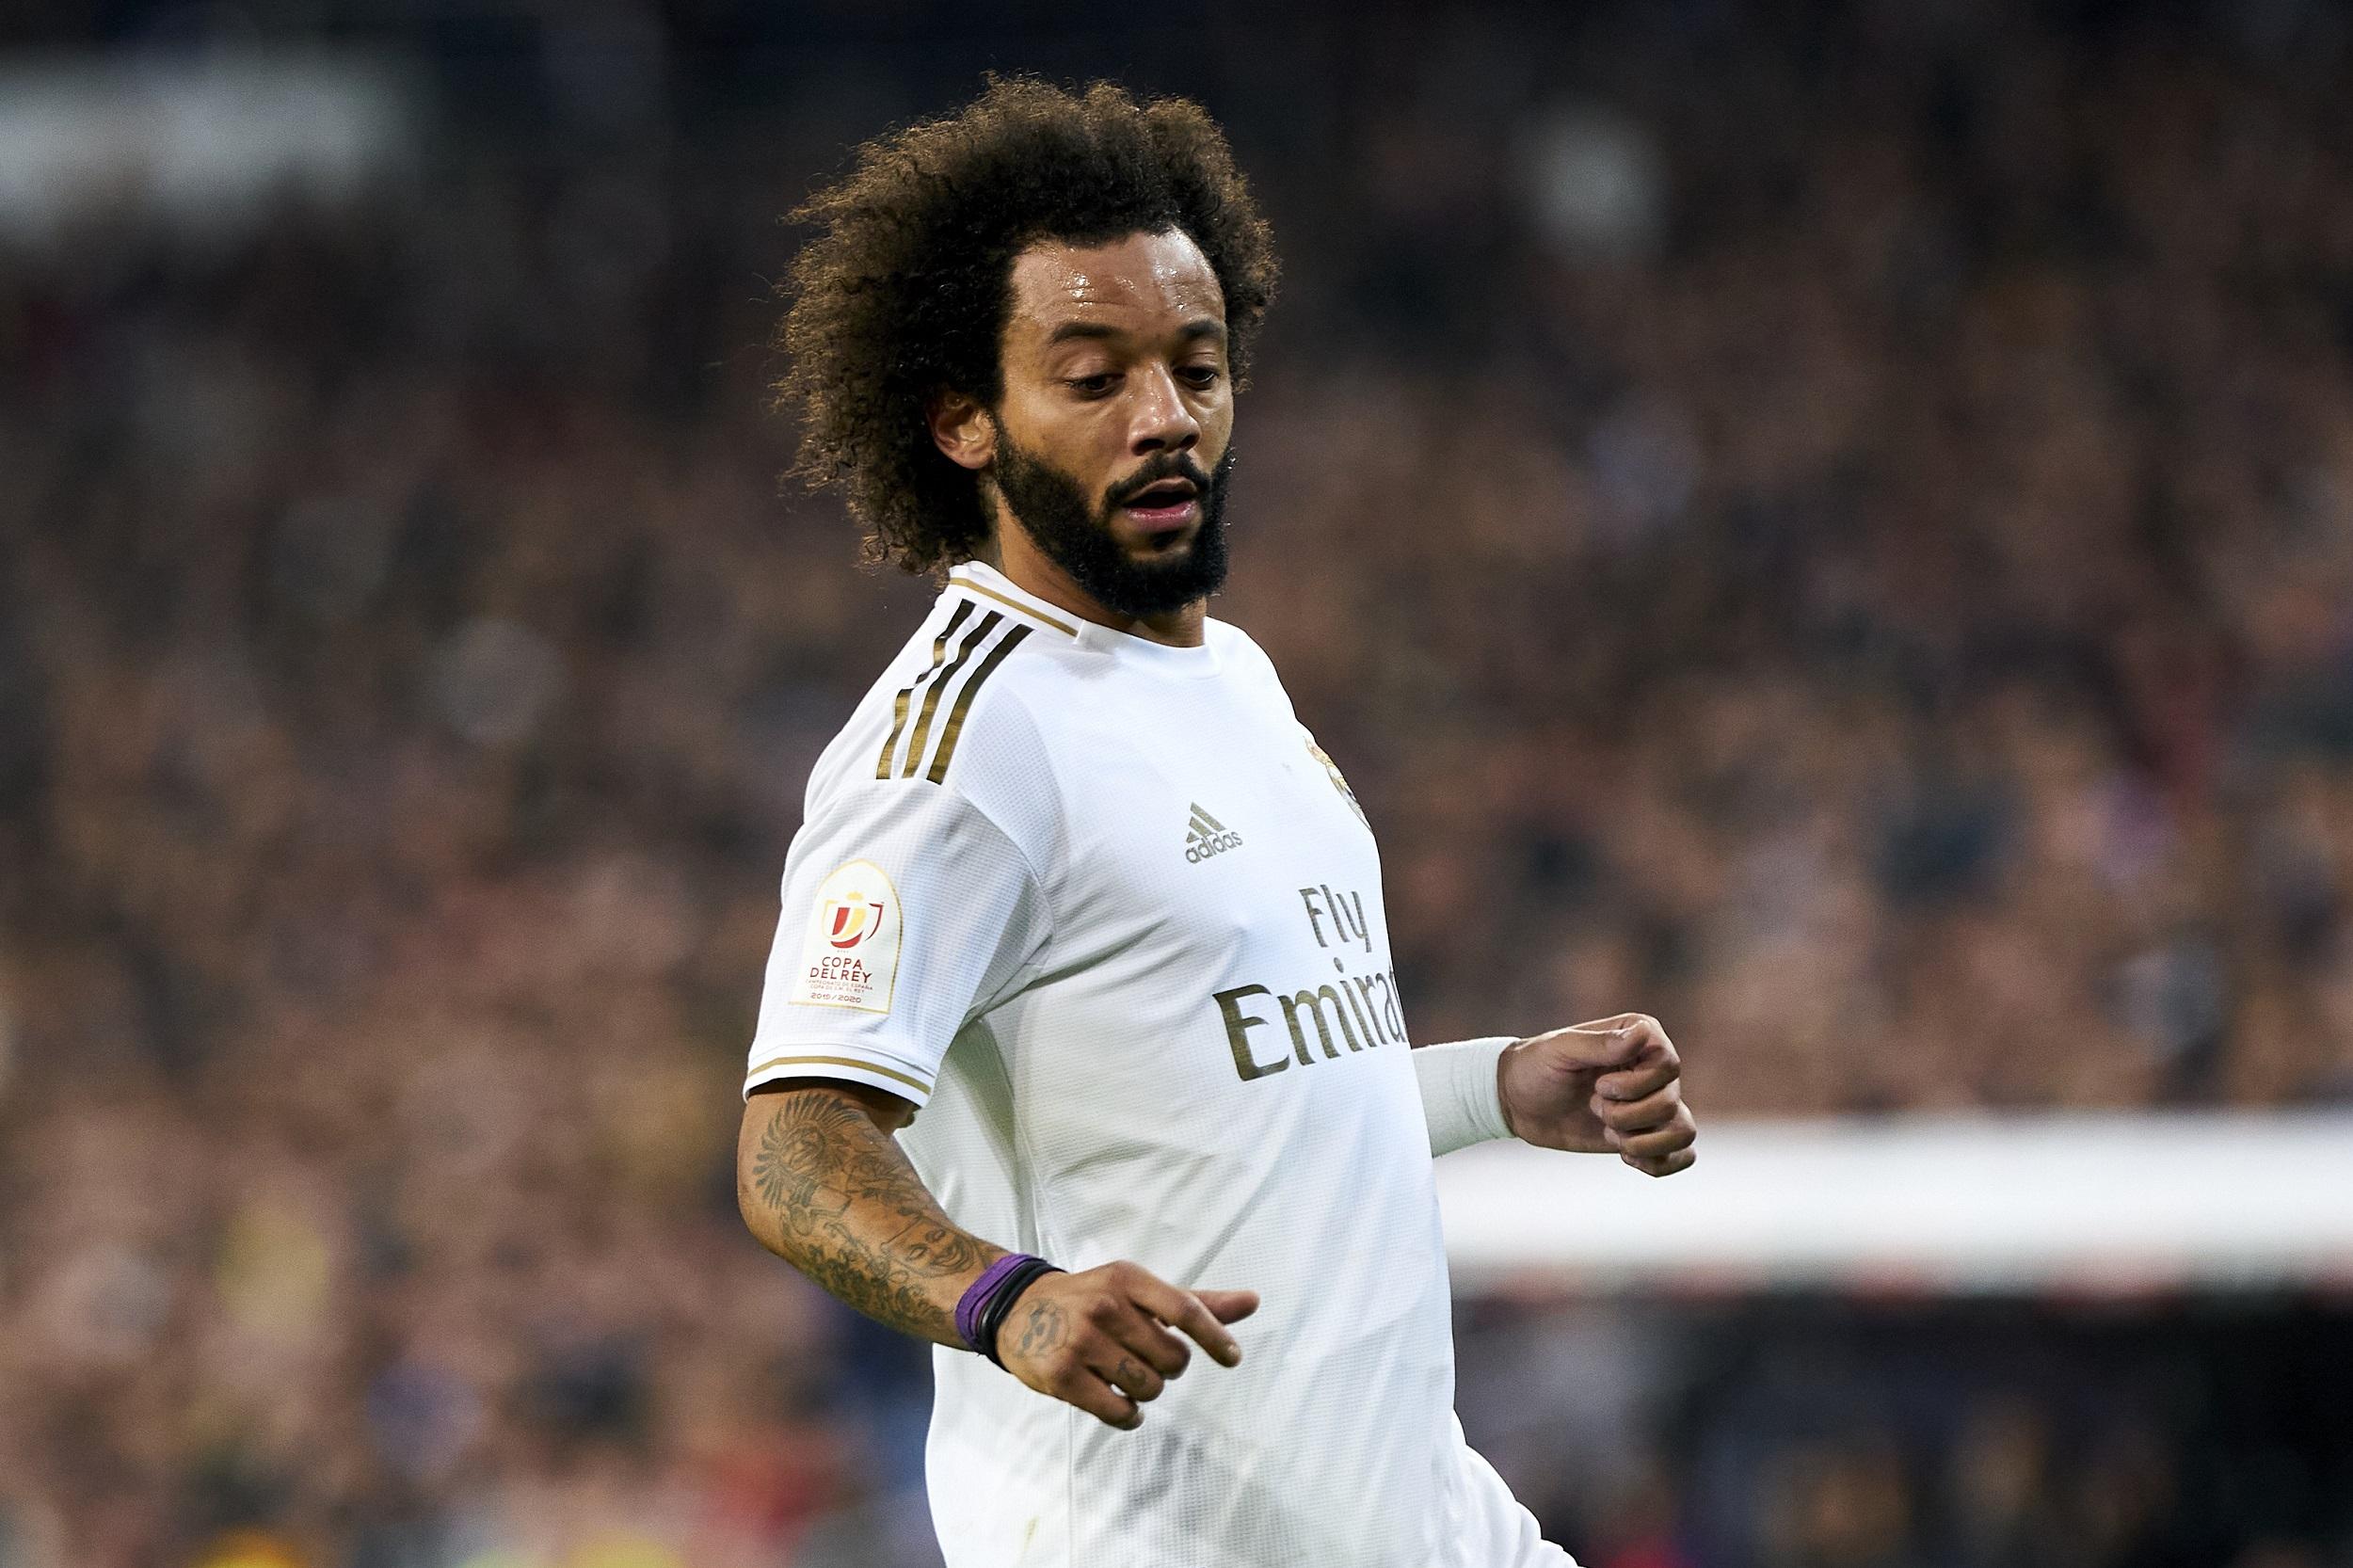 Football - Transferts - Le journal du mercato : la Juventus ne lâche pas Marcelo